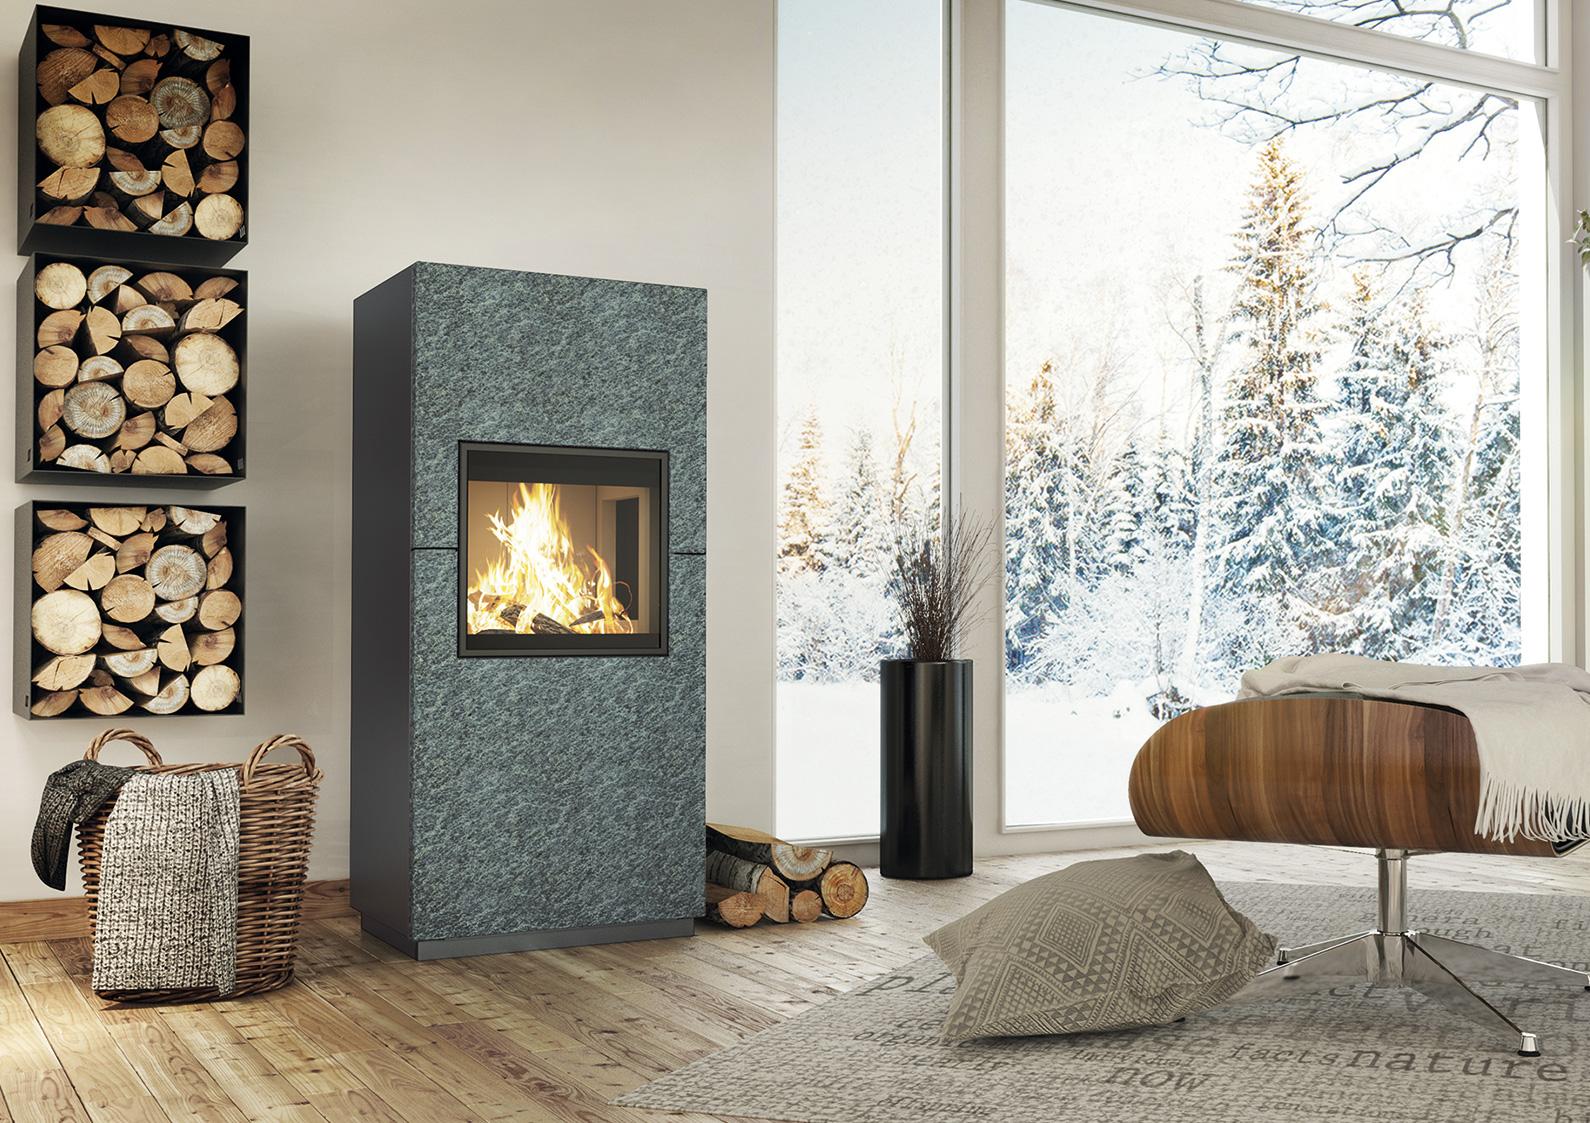 neuheiten kamin und kaminofen gro handel neustrelitz. Black Bedroom Furniture Sets. Home Design Ideas